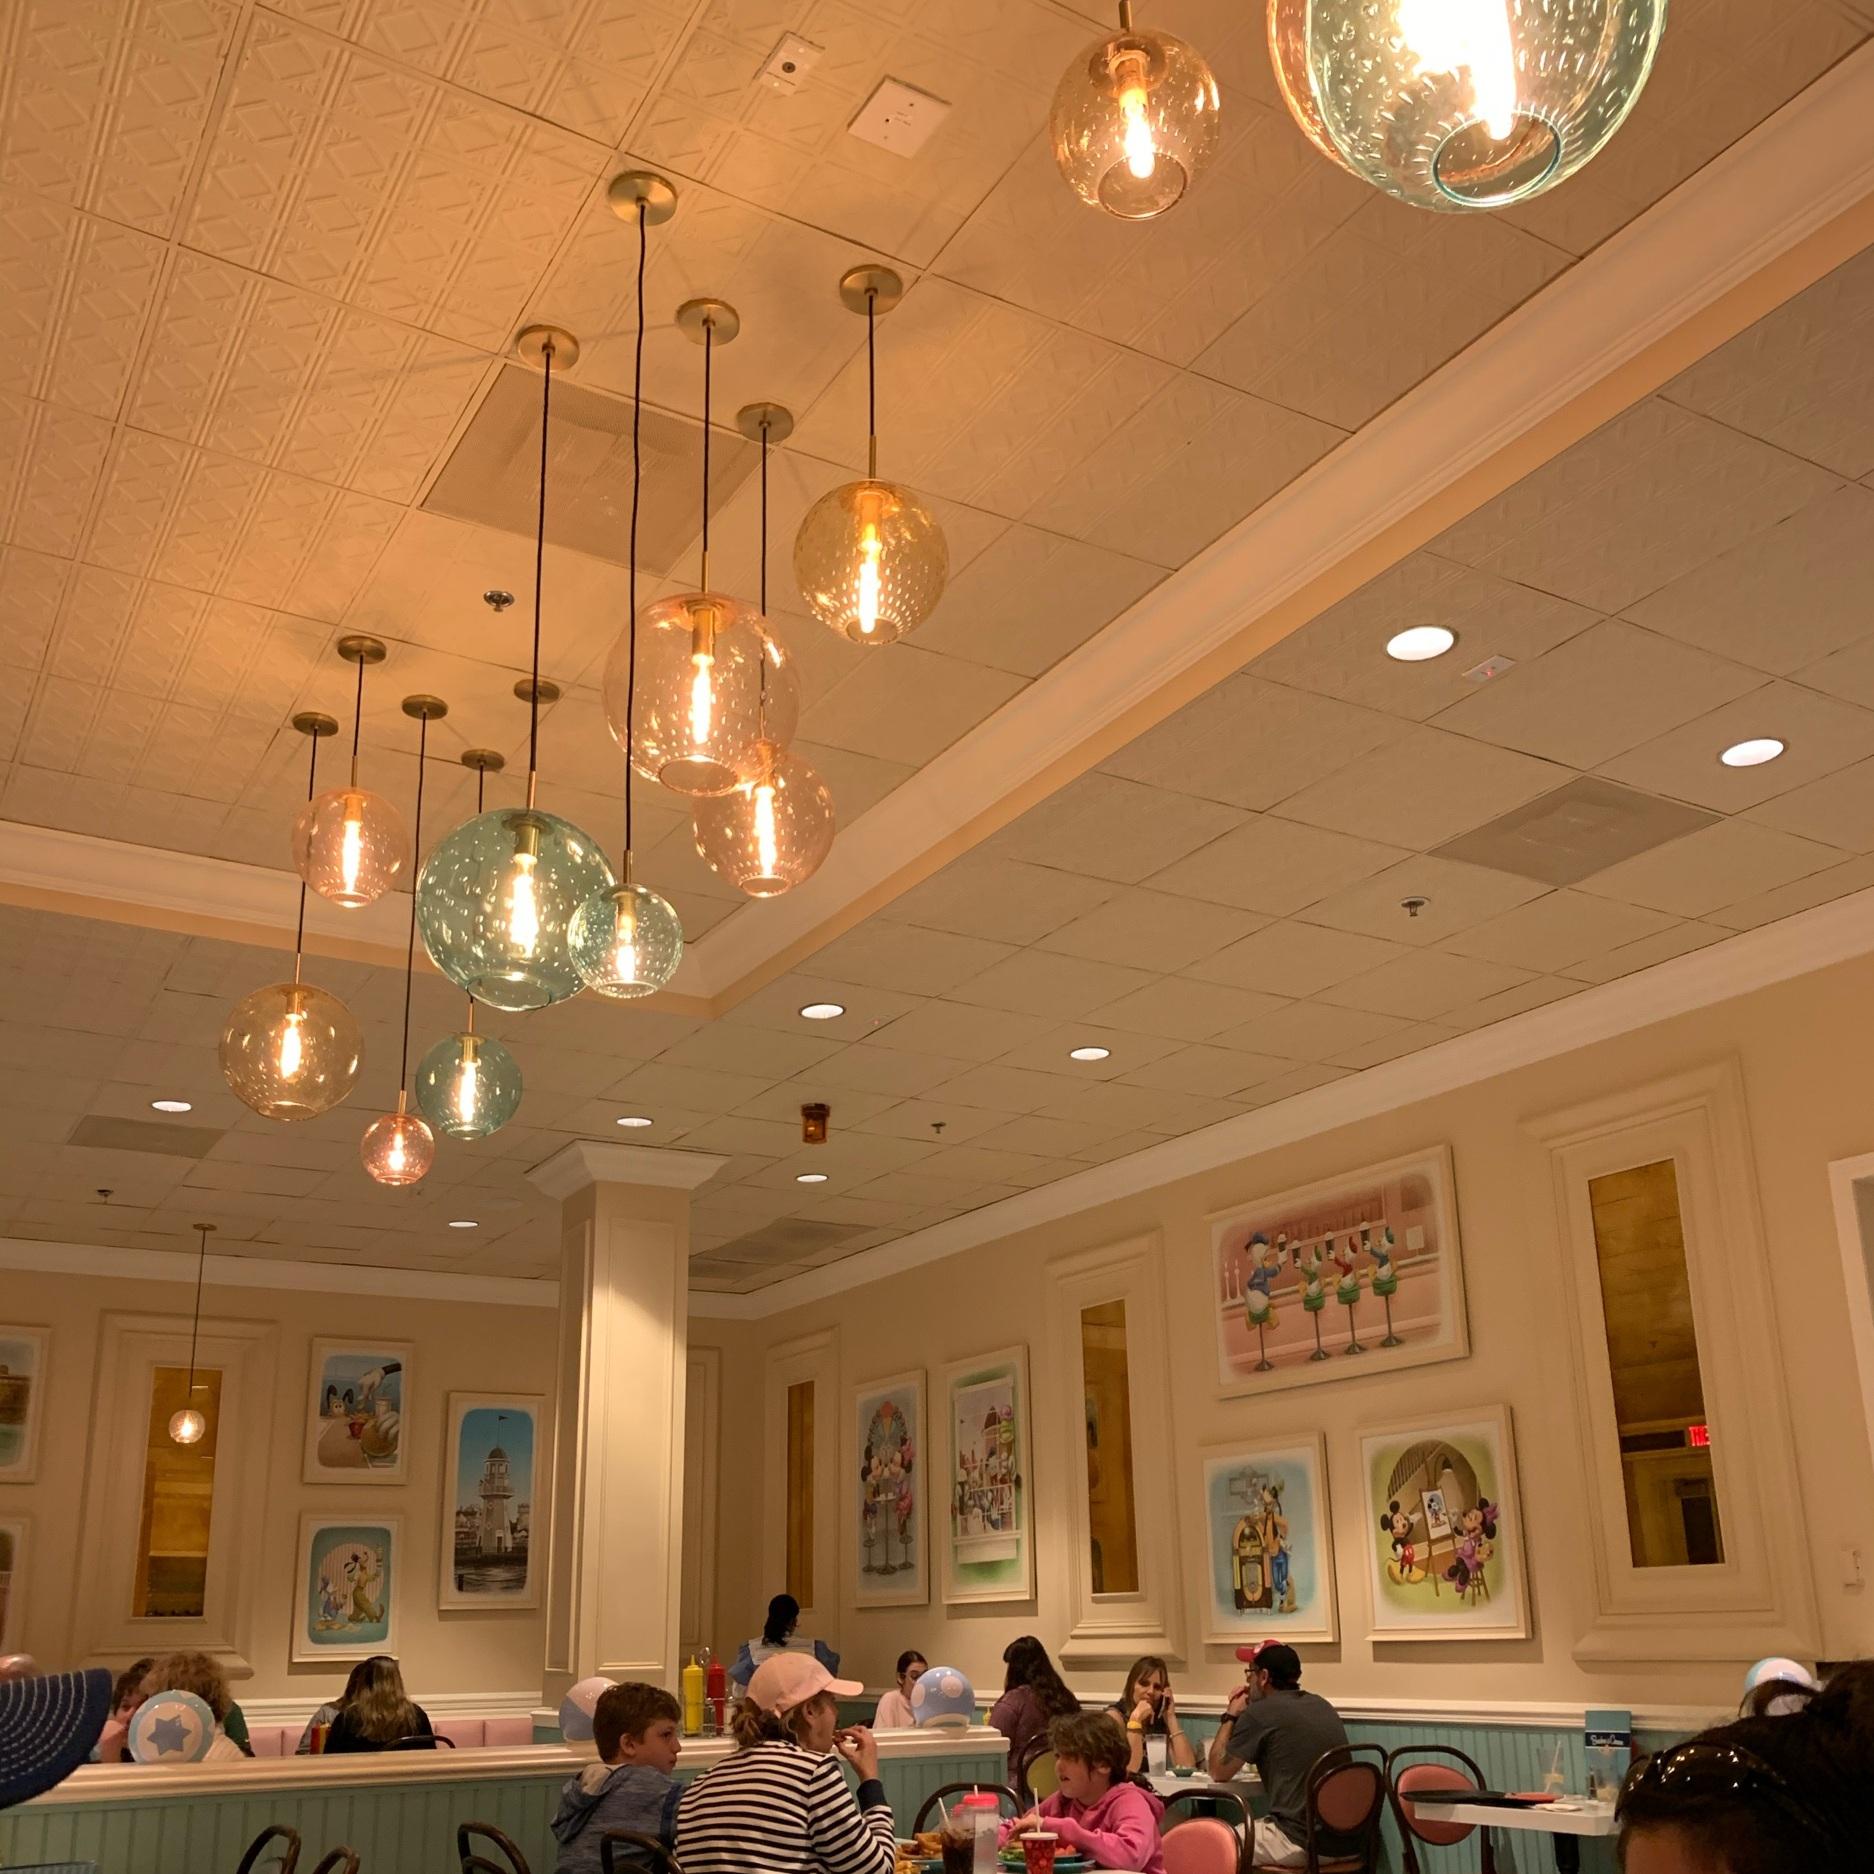 Beaches & Cream Dining Room (Beaches & Cream Soda Shop)